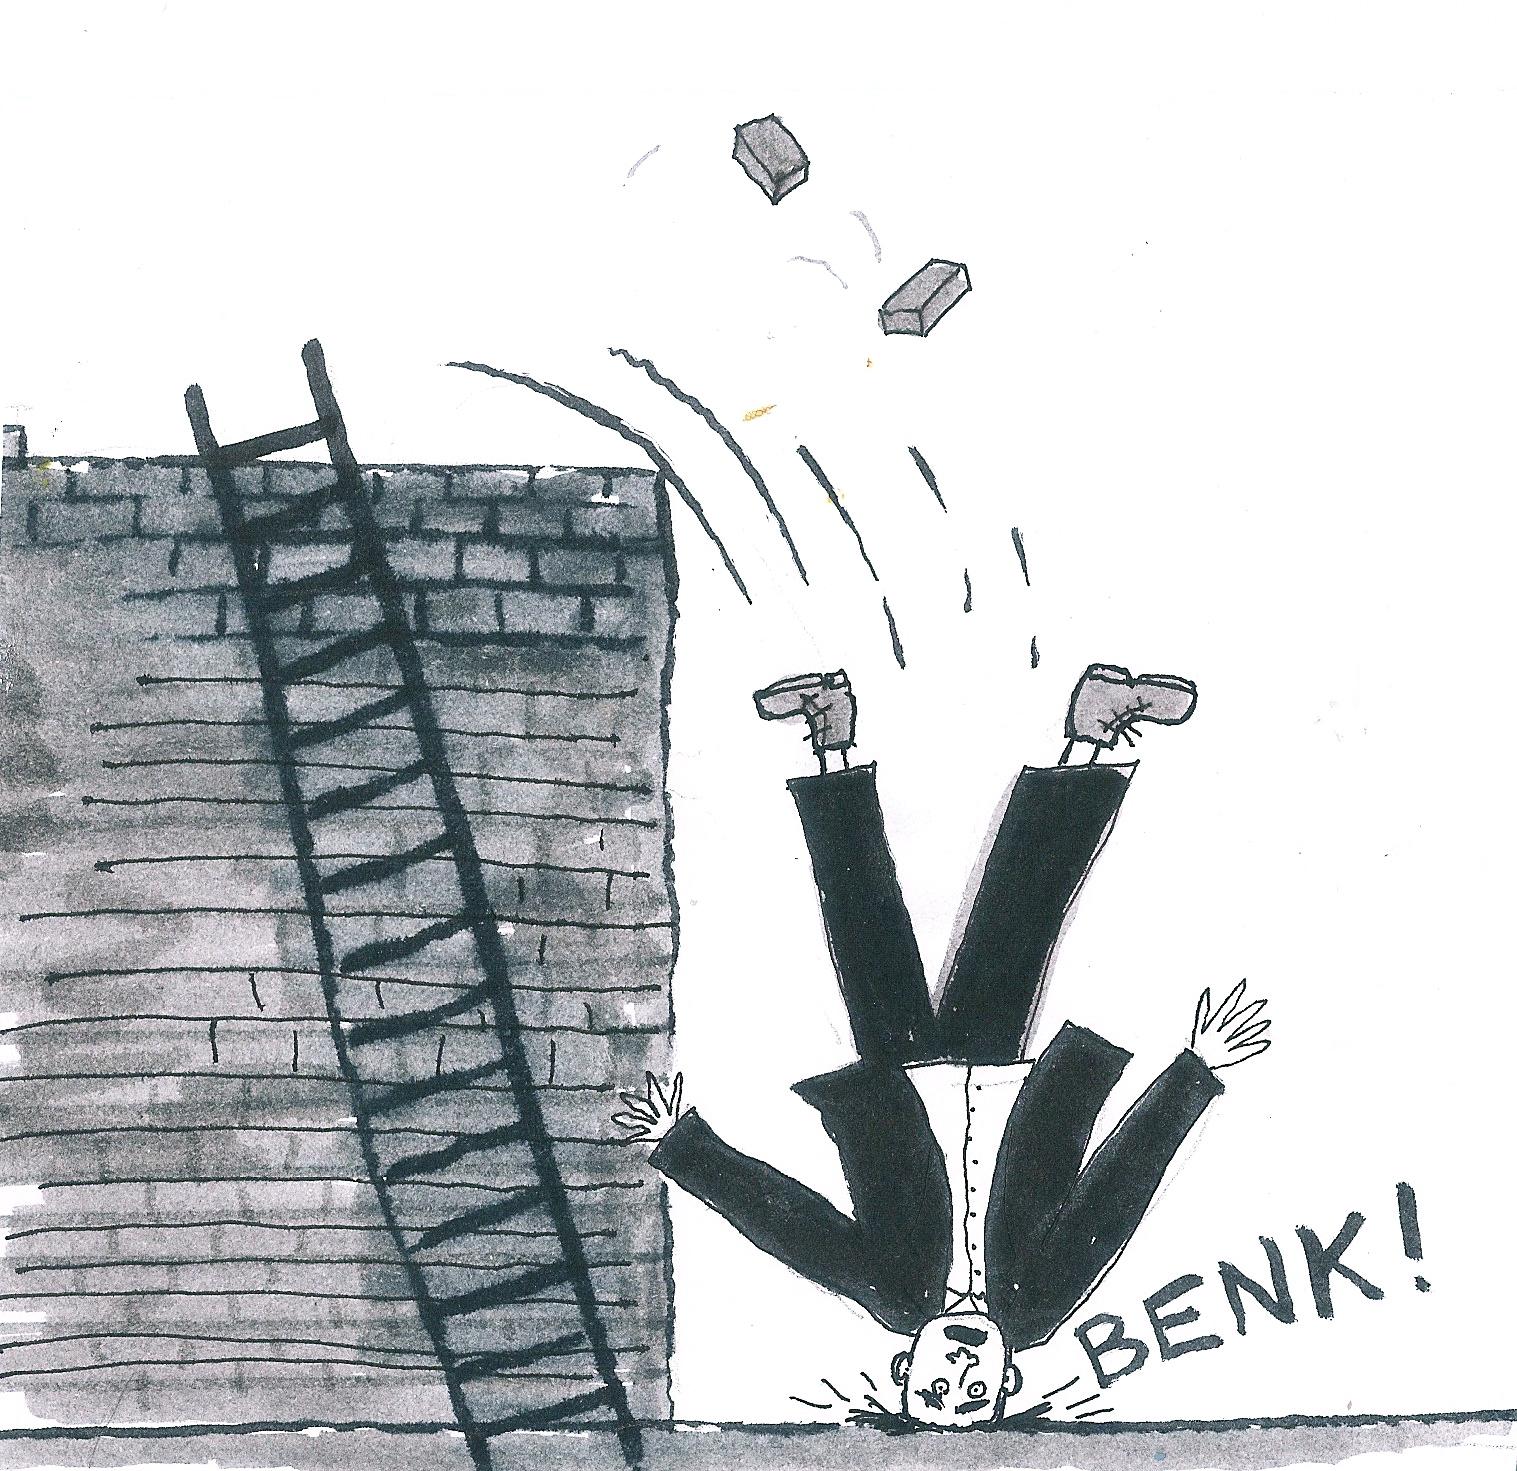 benk bank